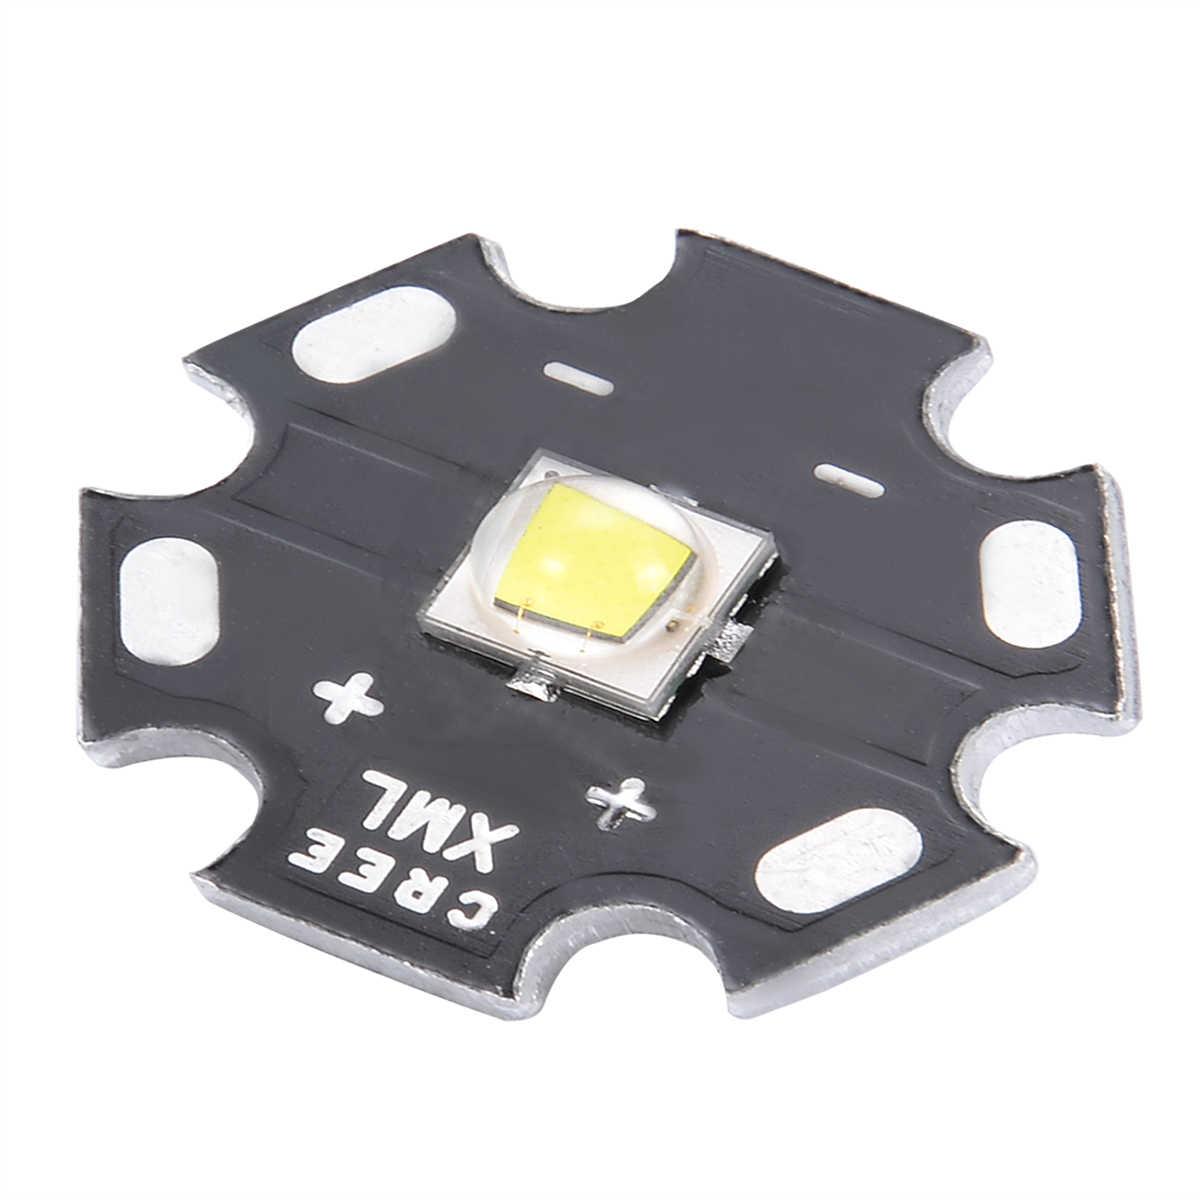 Cree XM-L2 U3 Bin 10W 3A 1260lm Neutral White Light LED Emitter 20mm Star USA